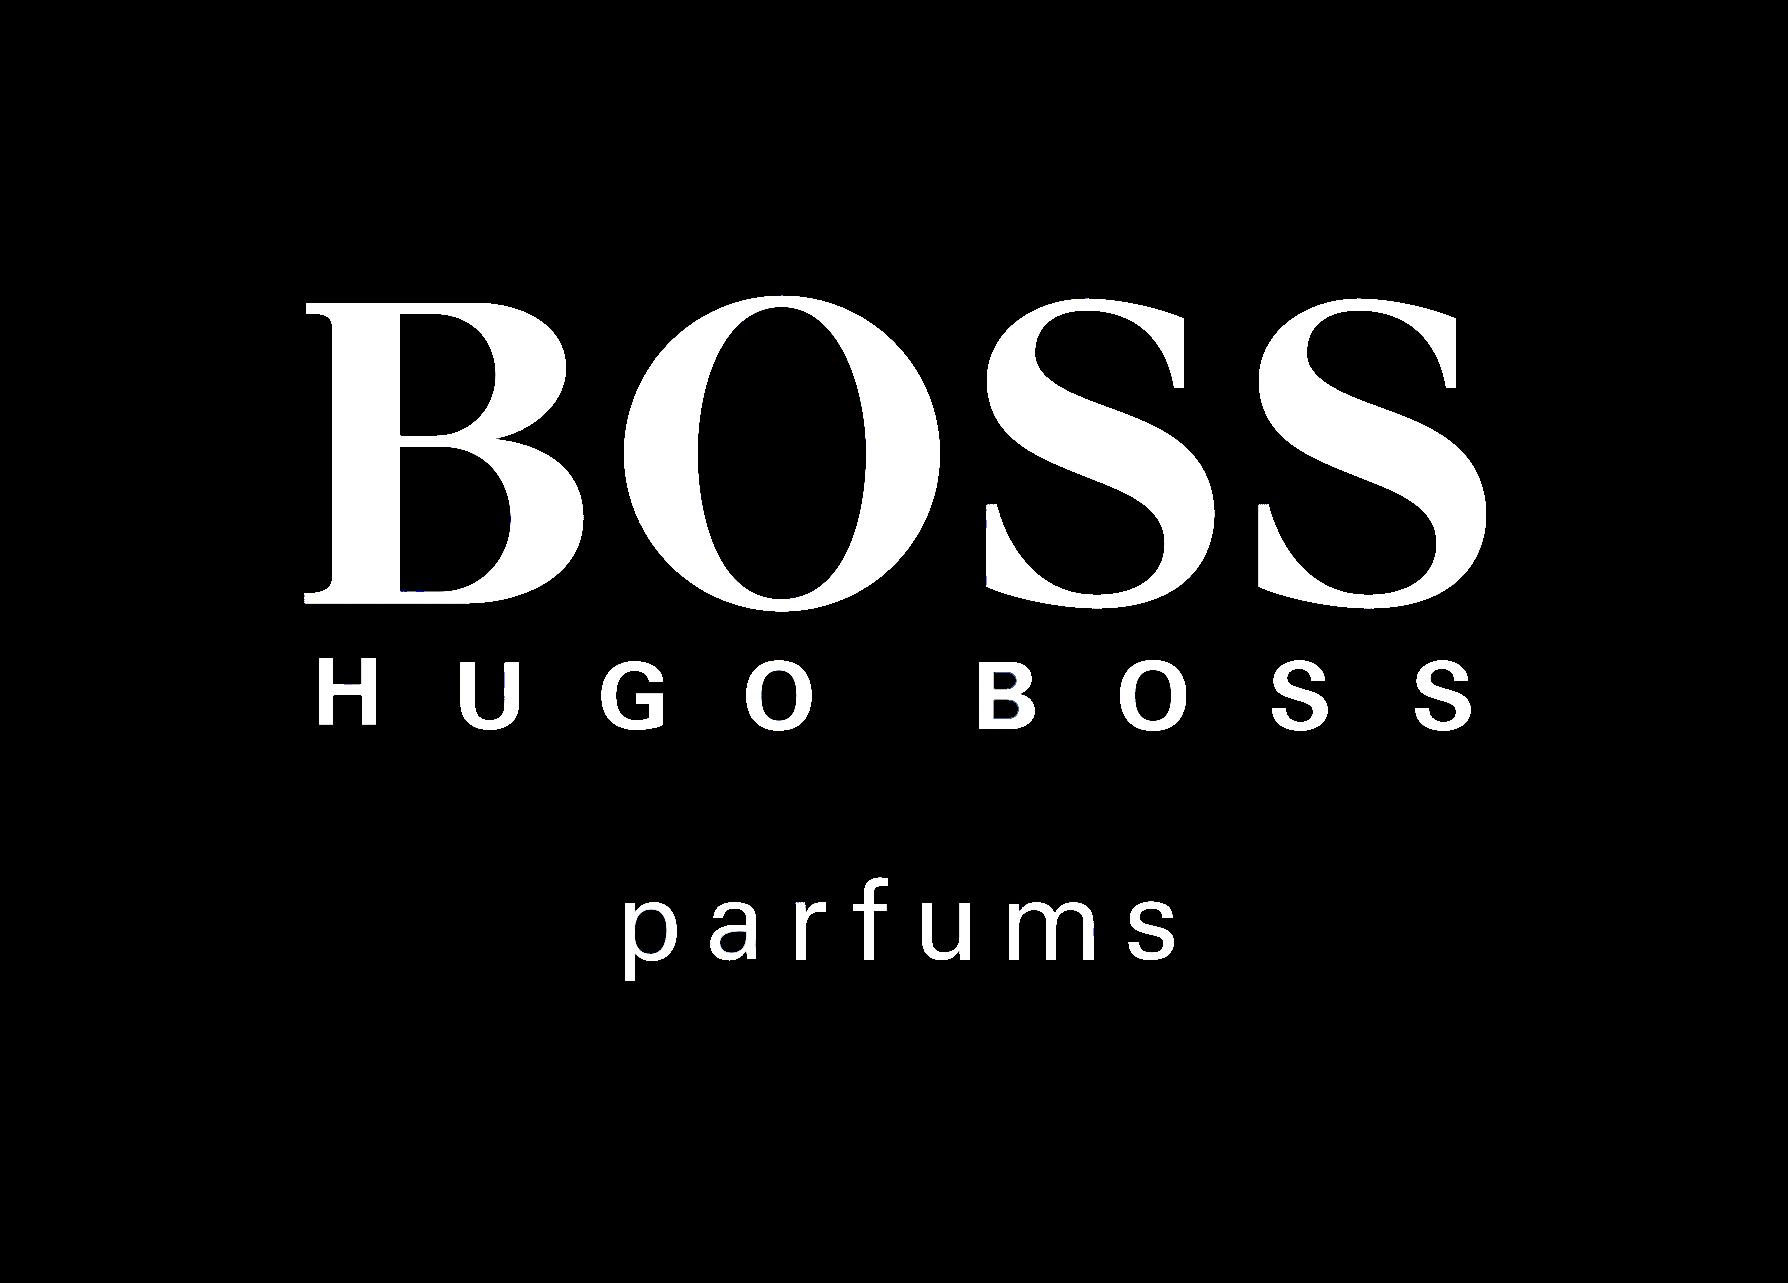 https://augustman-uploads.s3.ap-southeast-1.amazonaws.com/wp-content/uploads/2019/11/01172648/Boss-Logo-PNG.png